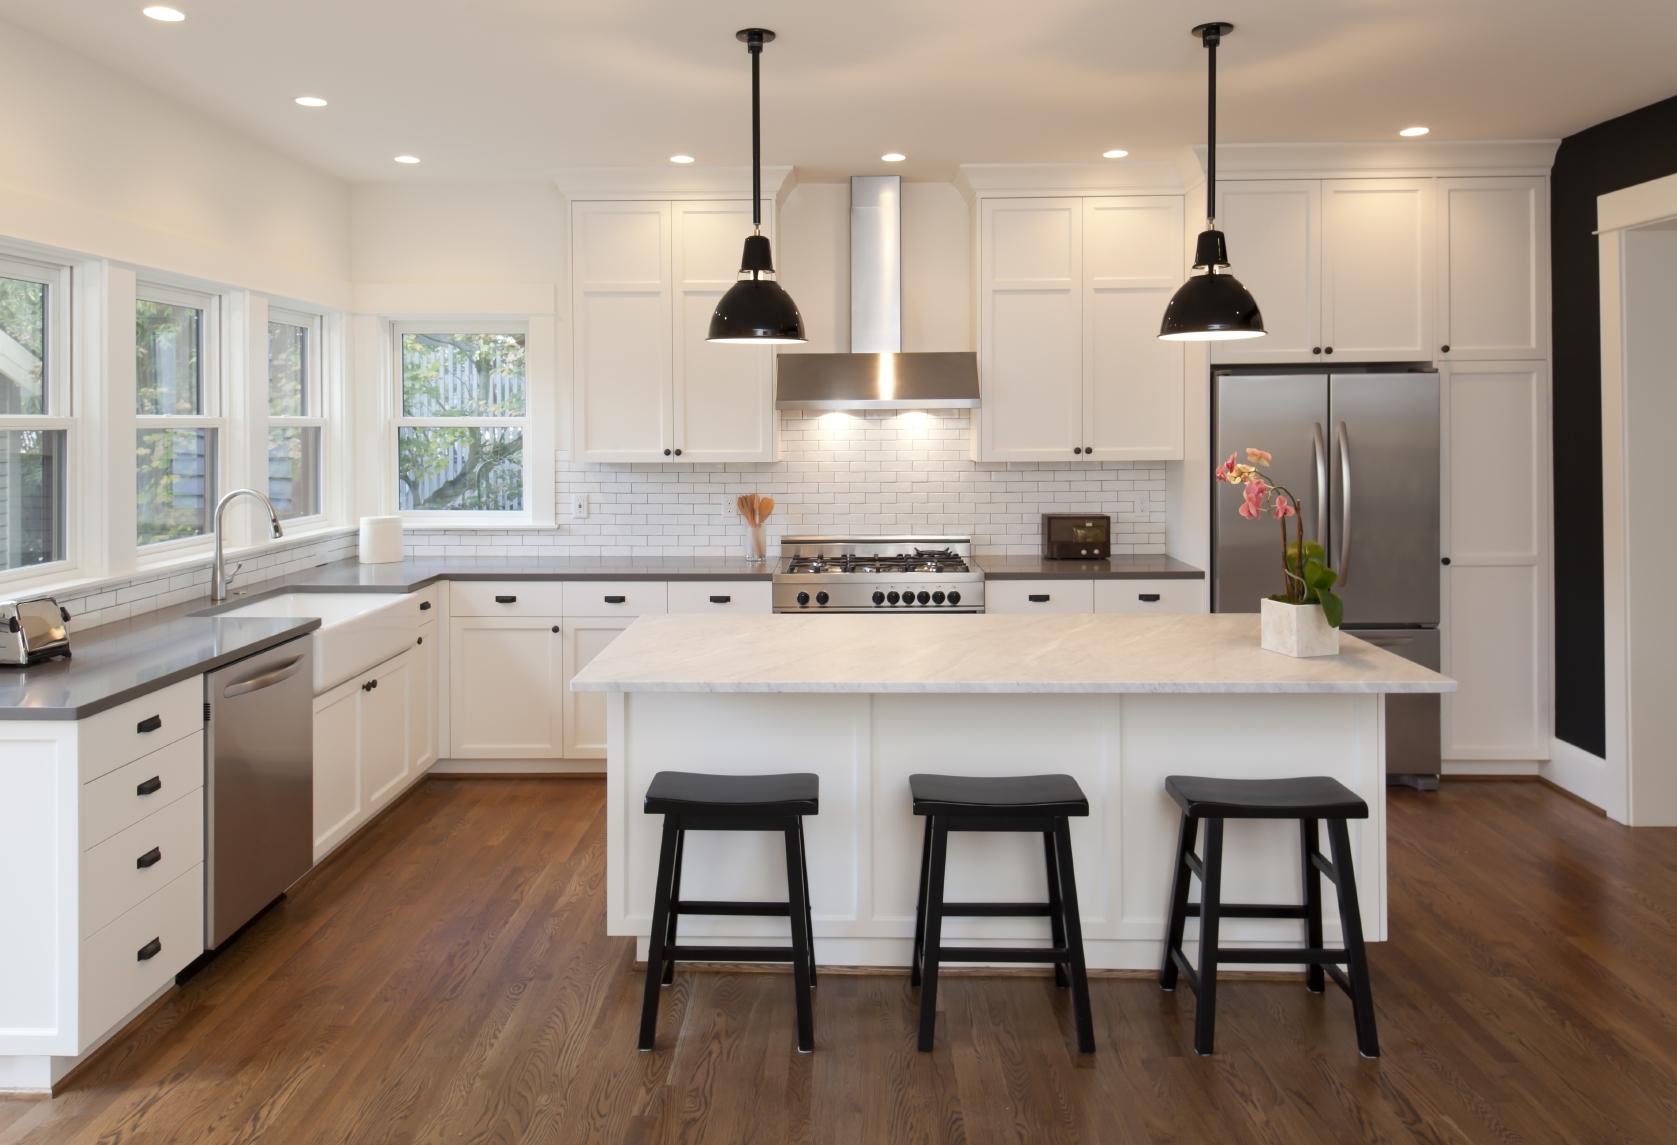 Five Fantastic Kitchen Remodeling Apps To Get Ideas